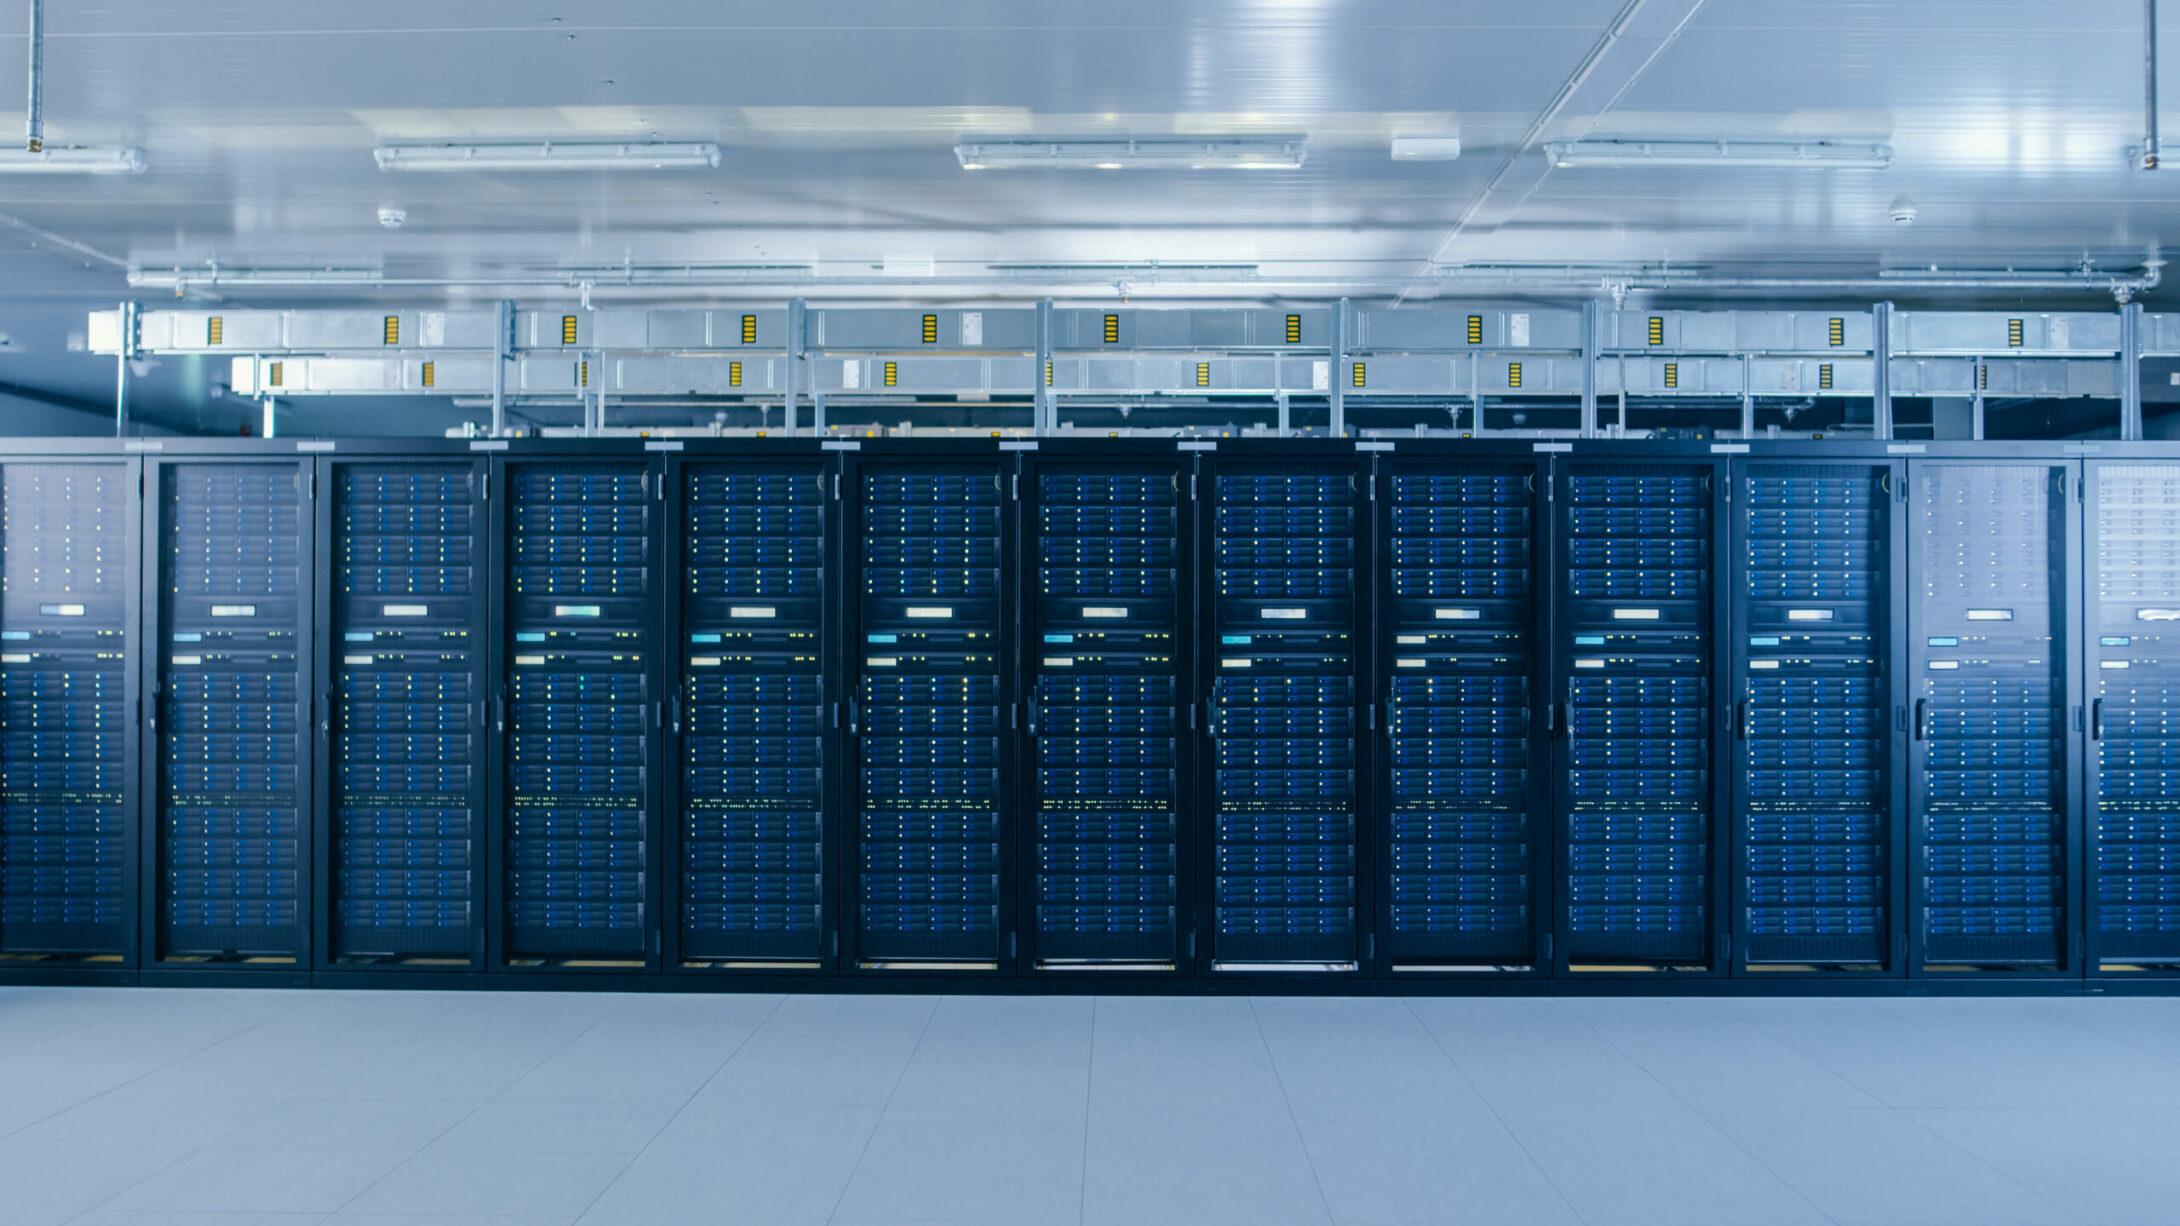 Telecom & Security systems provider